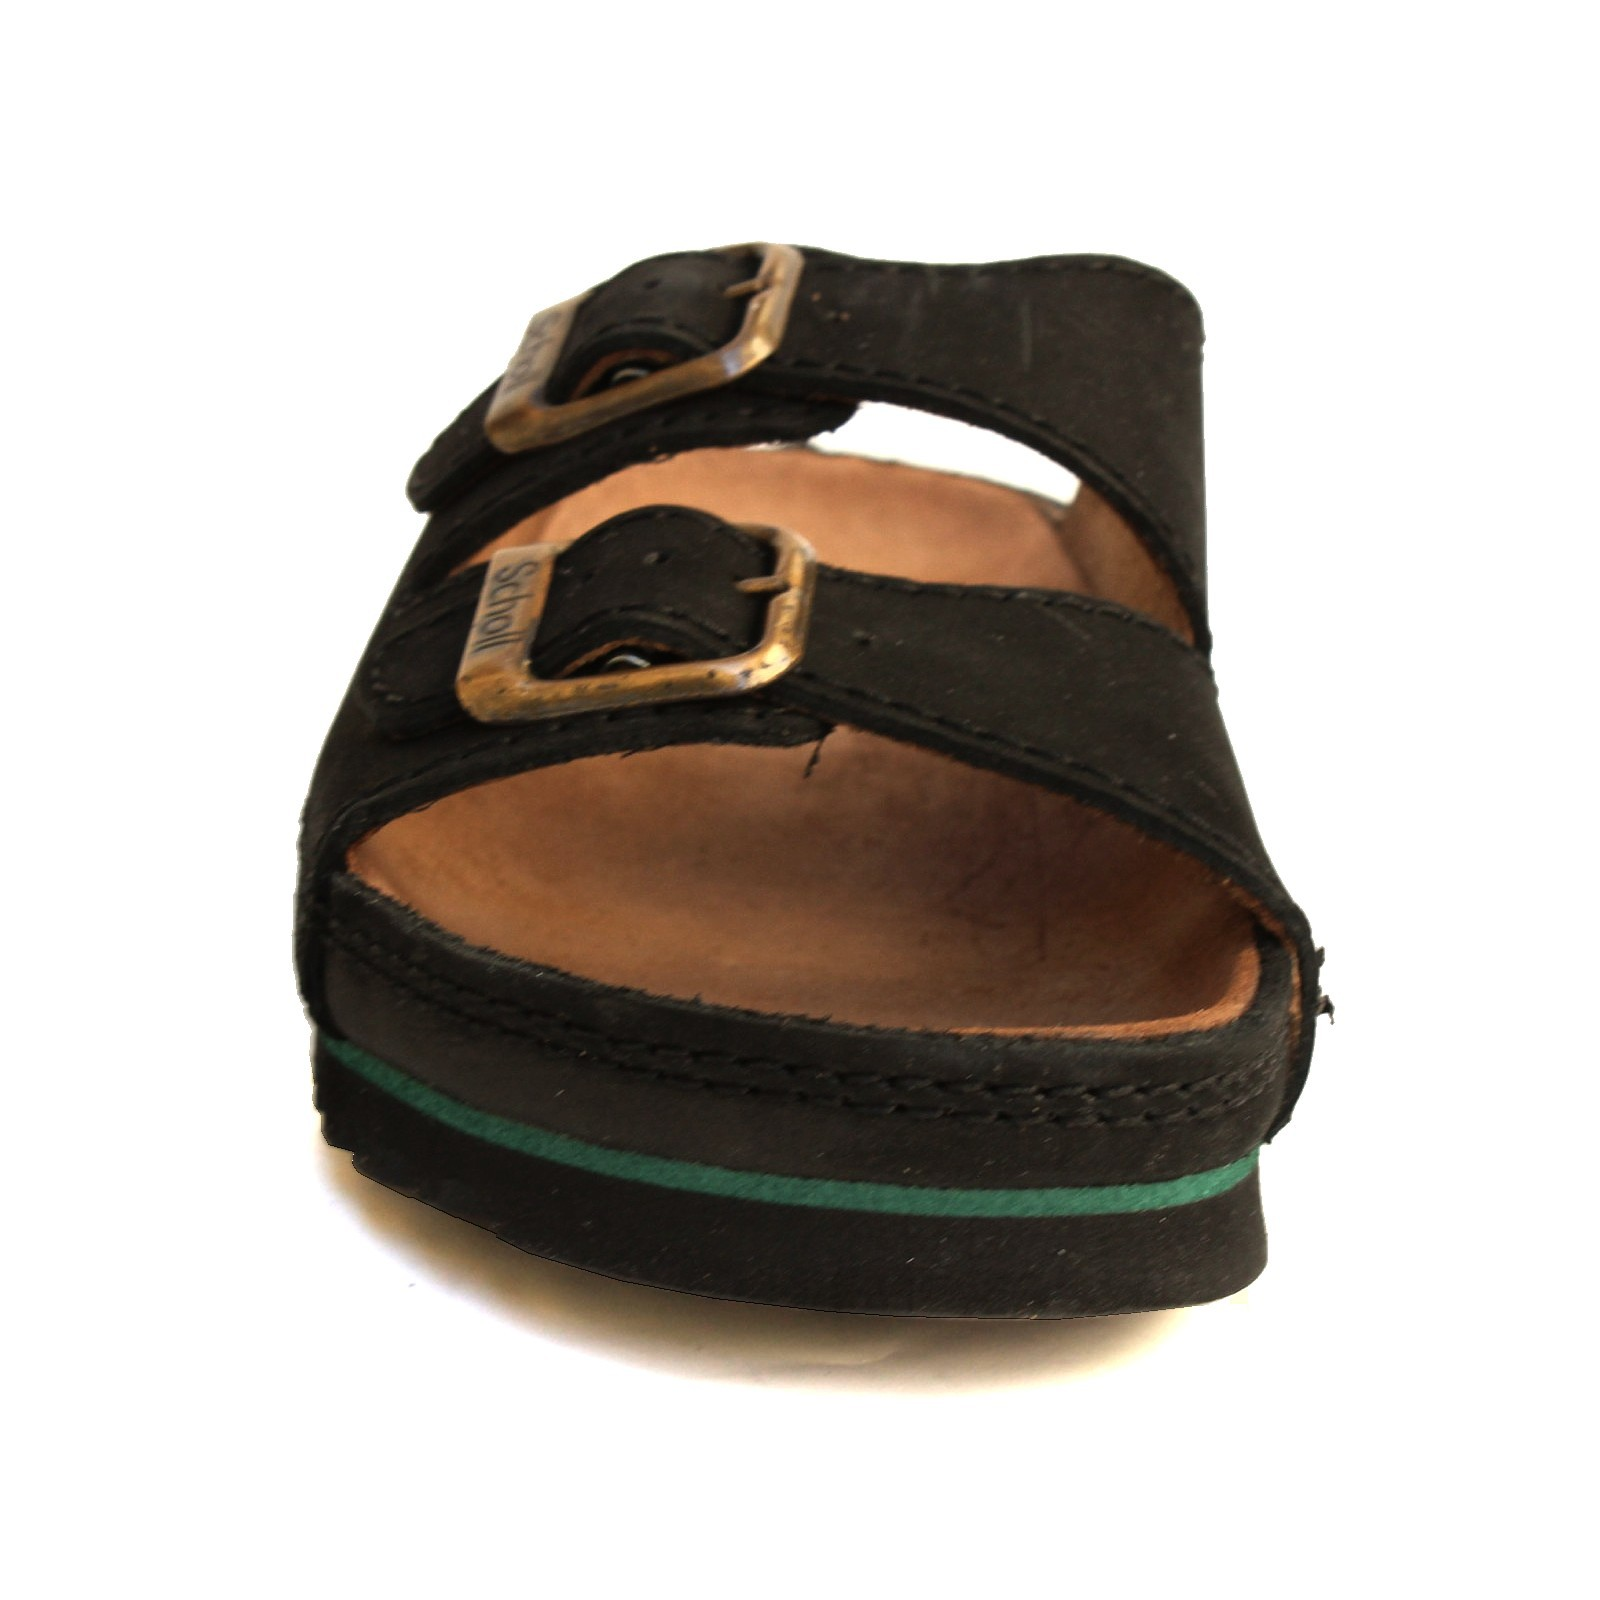 00848 Scholl Air Bag férfi papucs F21531 1004 Férfi papucs